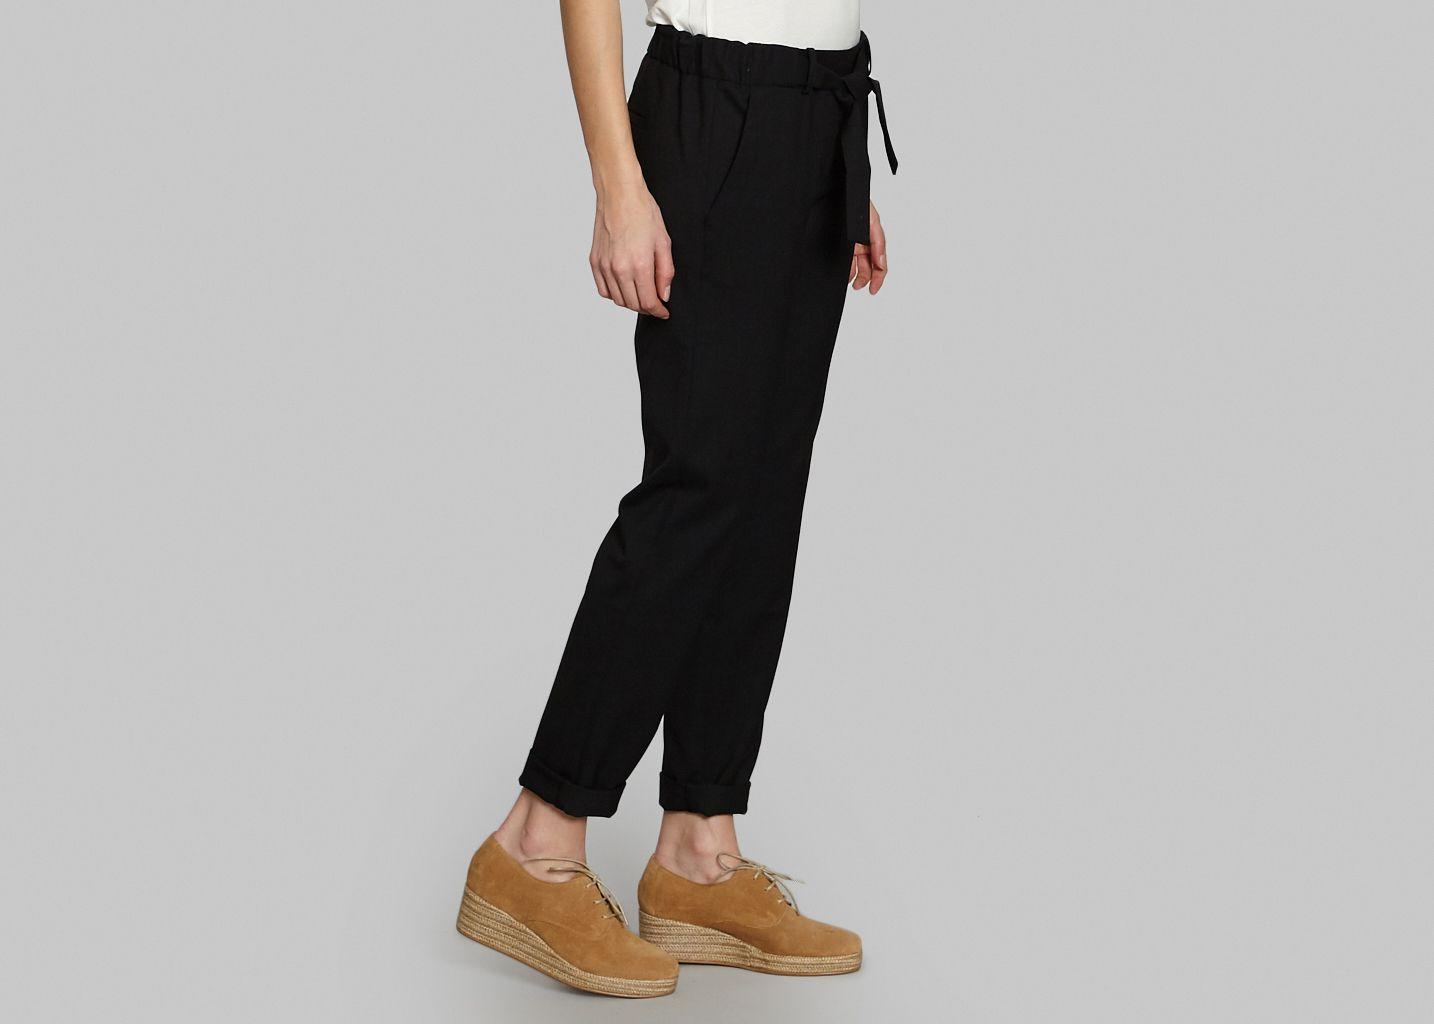 Pantalon Dominica - Sessùn